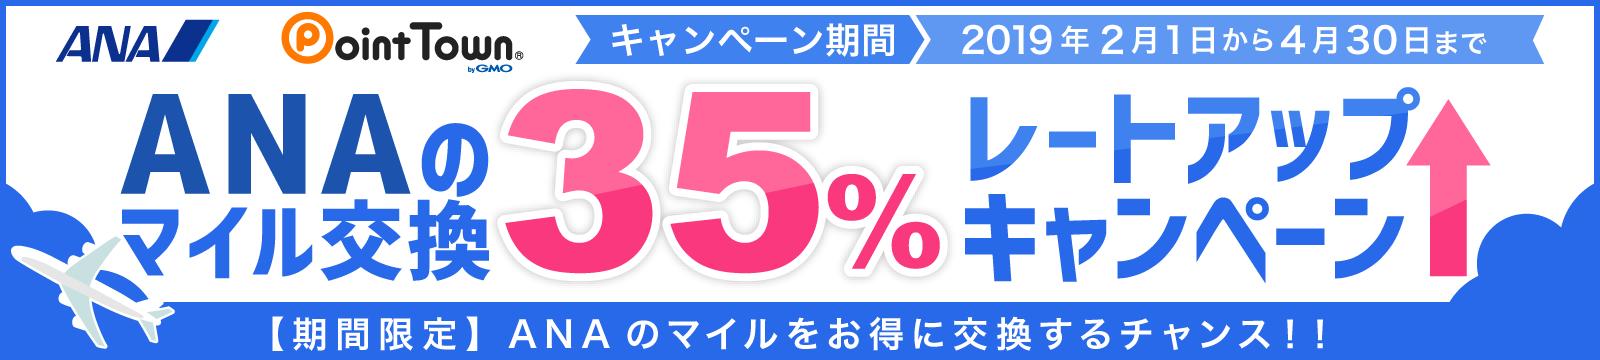 ANAマイル35%レートアップ